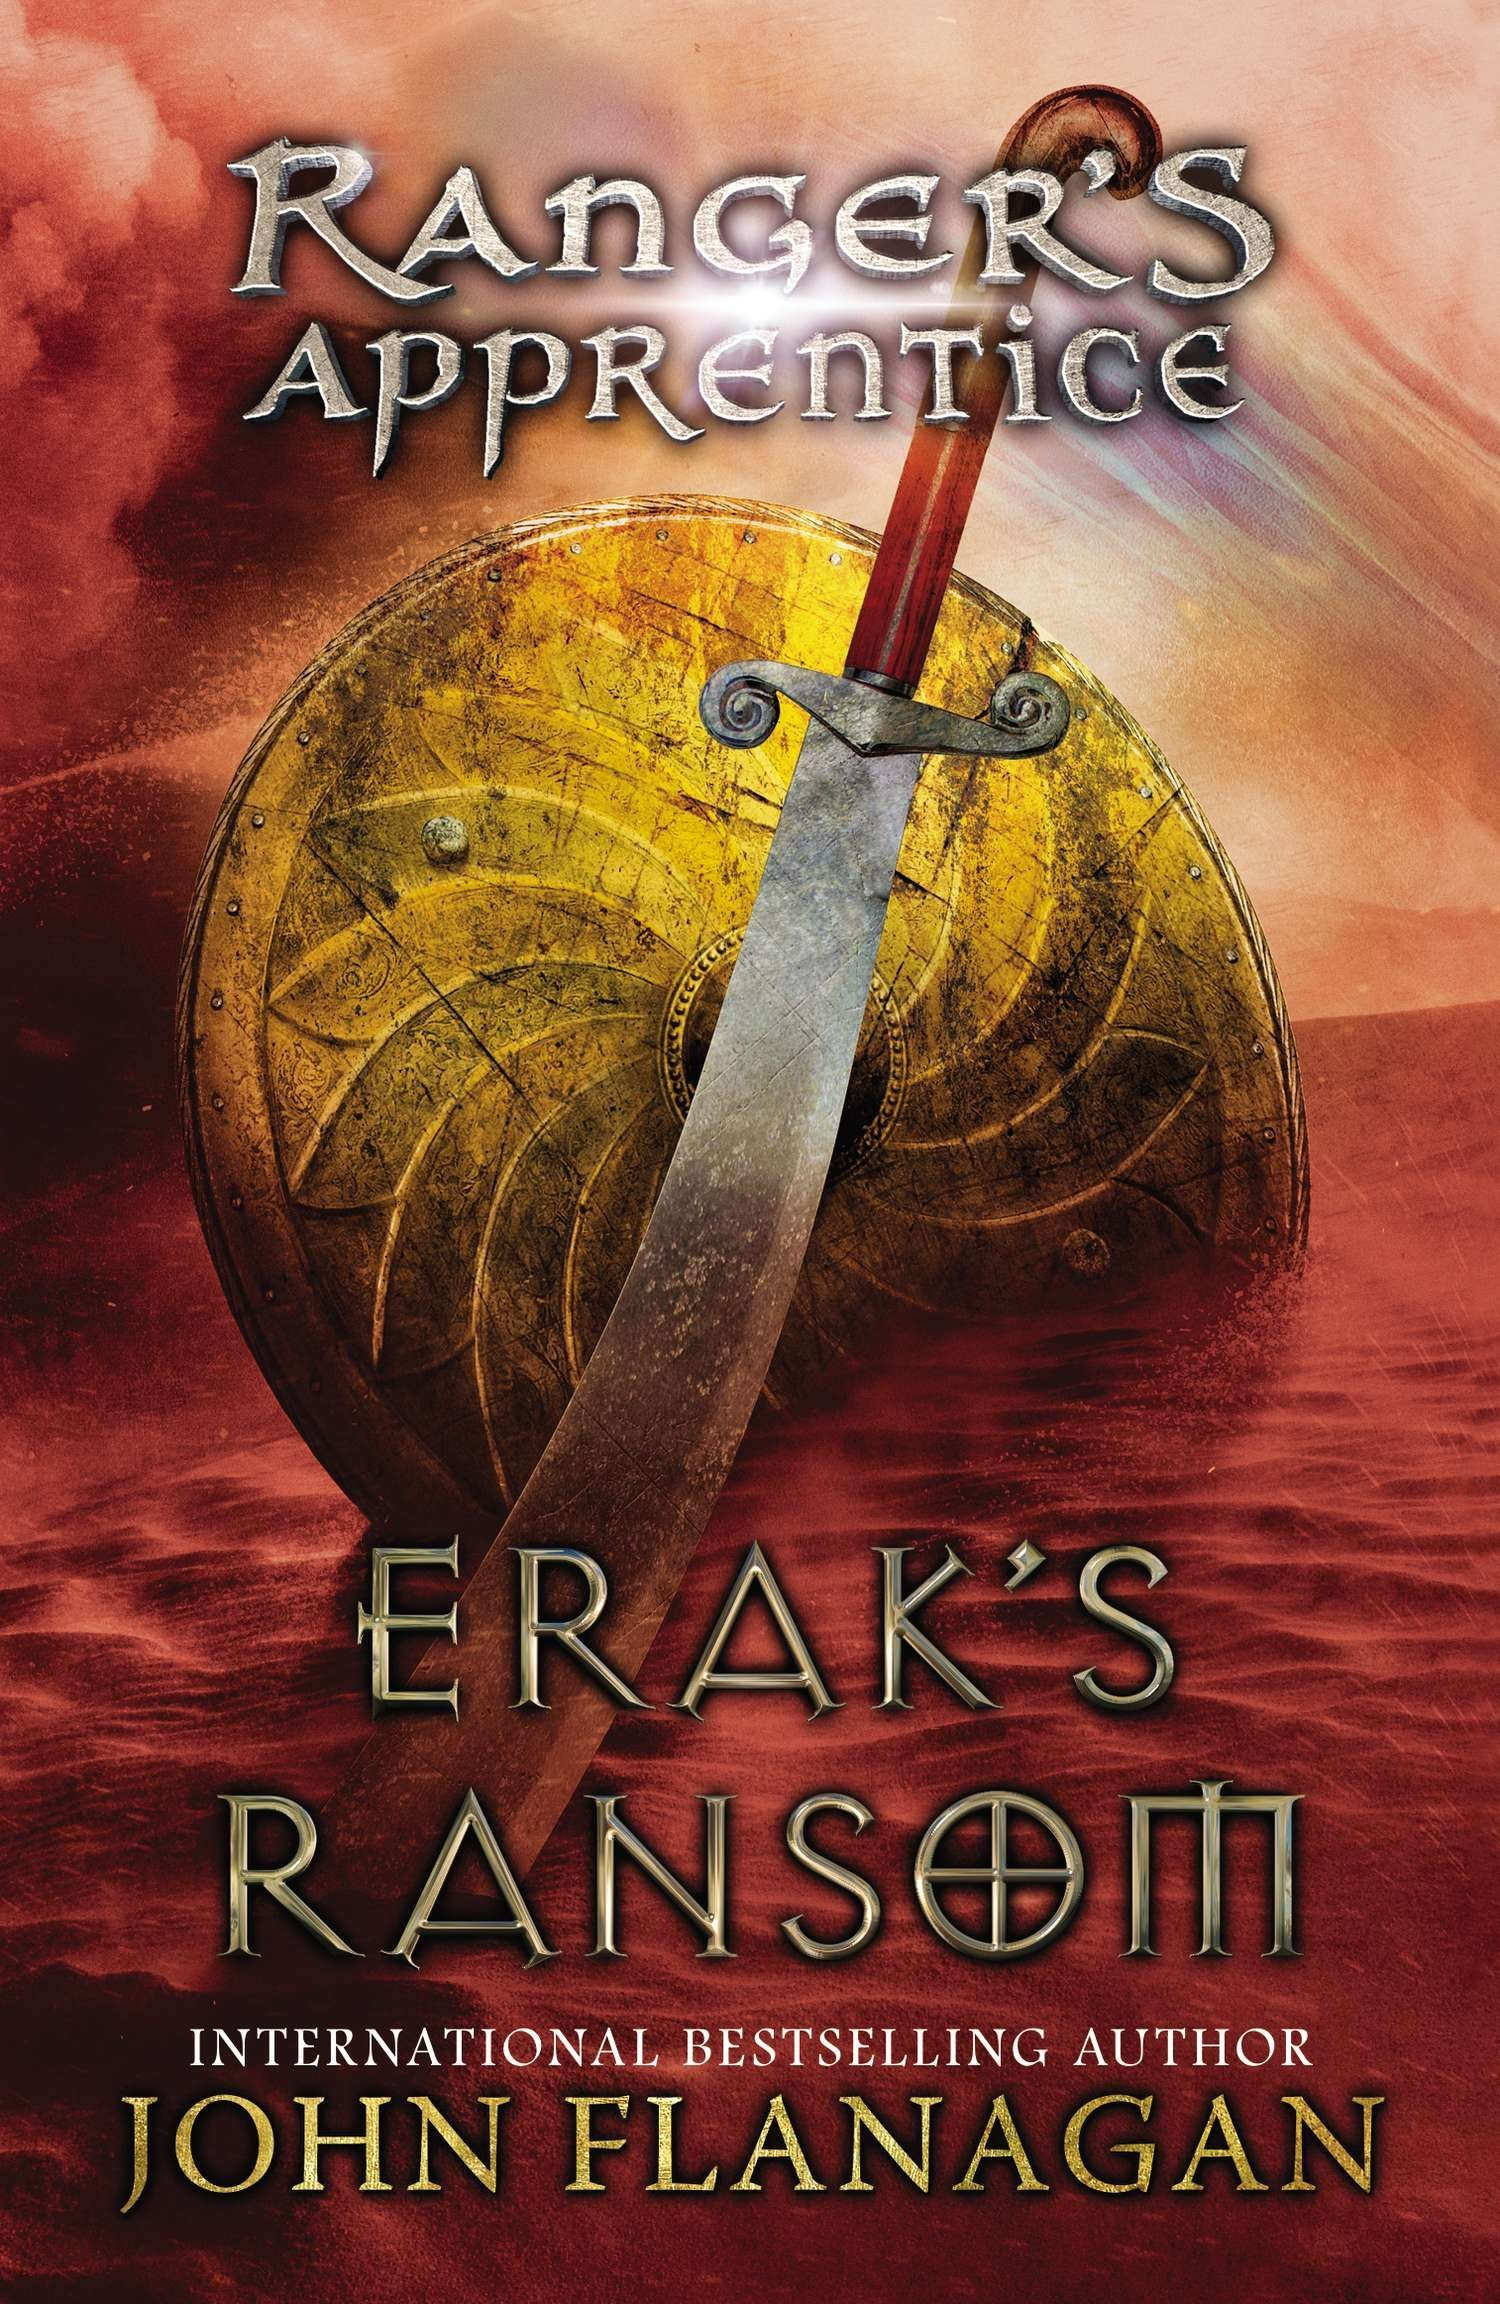 Download Erak's Ransom: Book 7 (Ranger's Apprentice) PDF